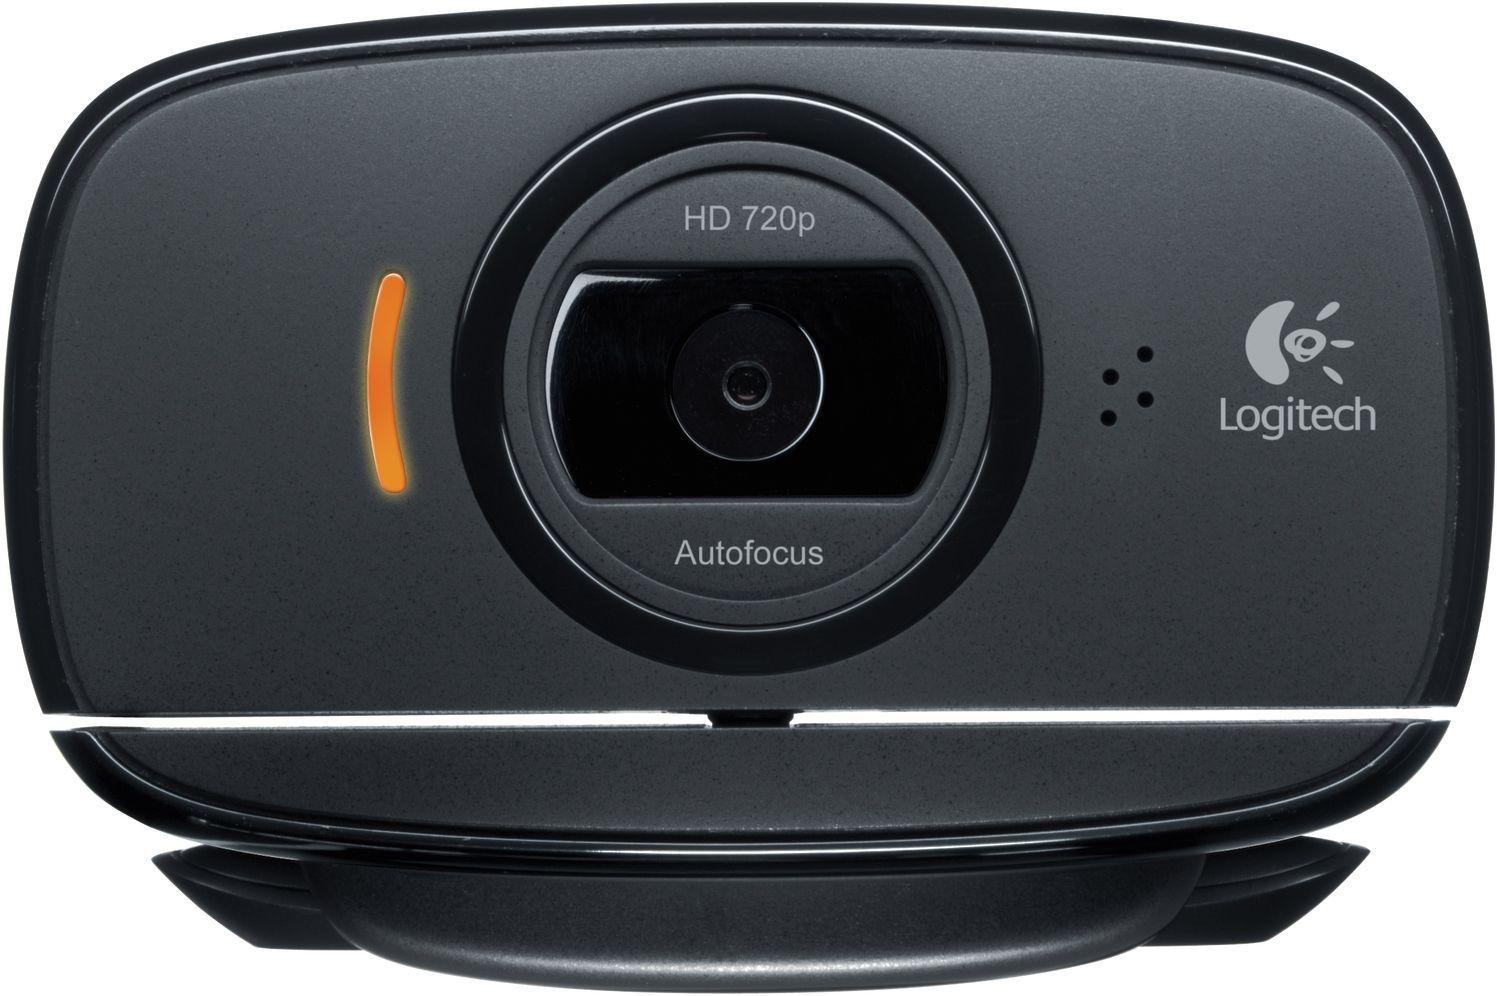 Image of Logitech - C525 HD Webcam.